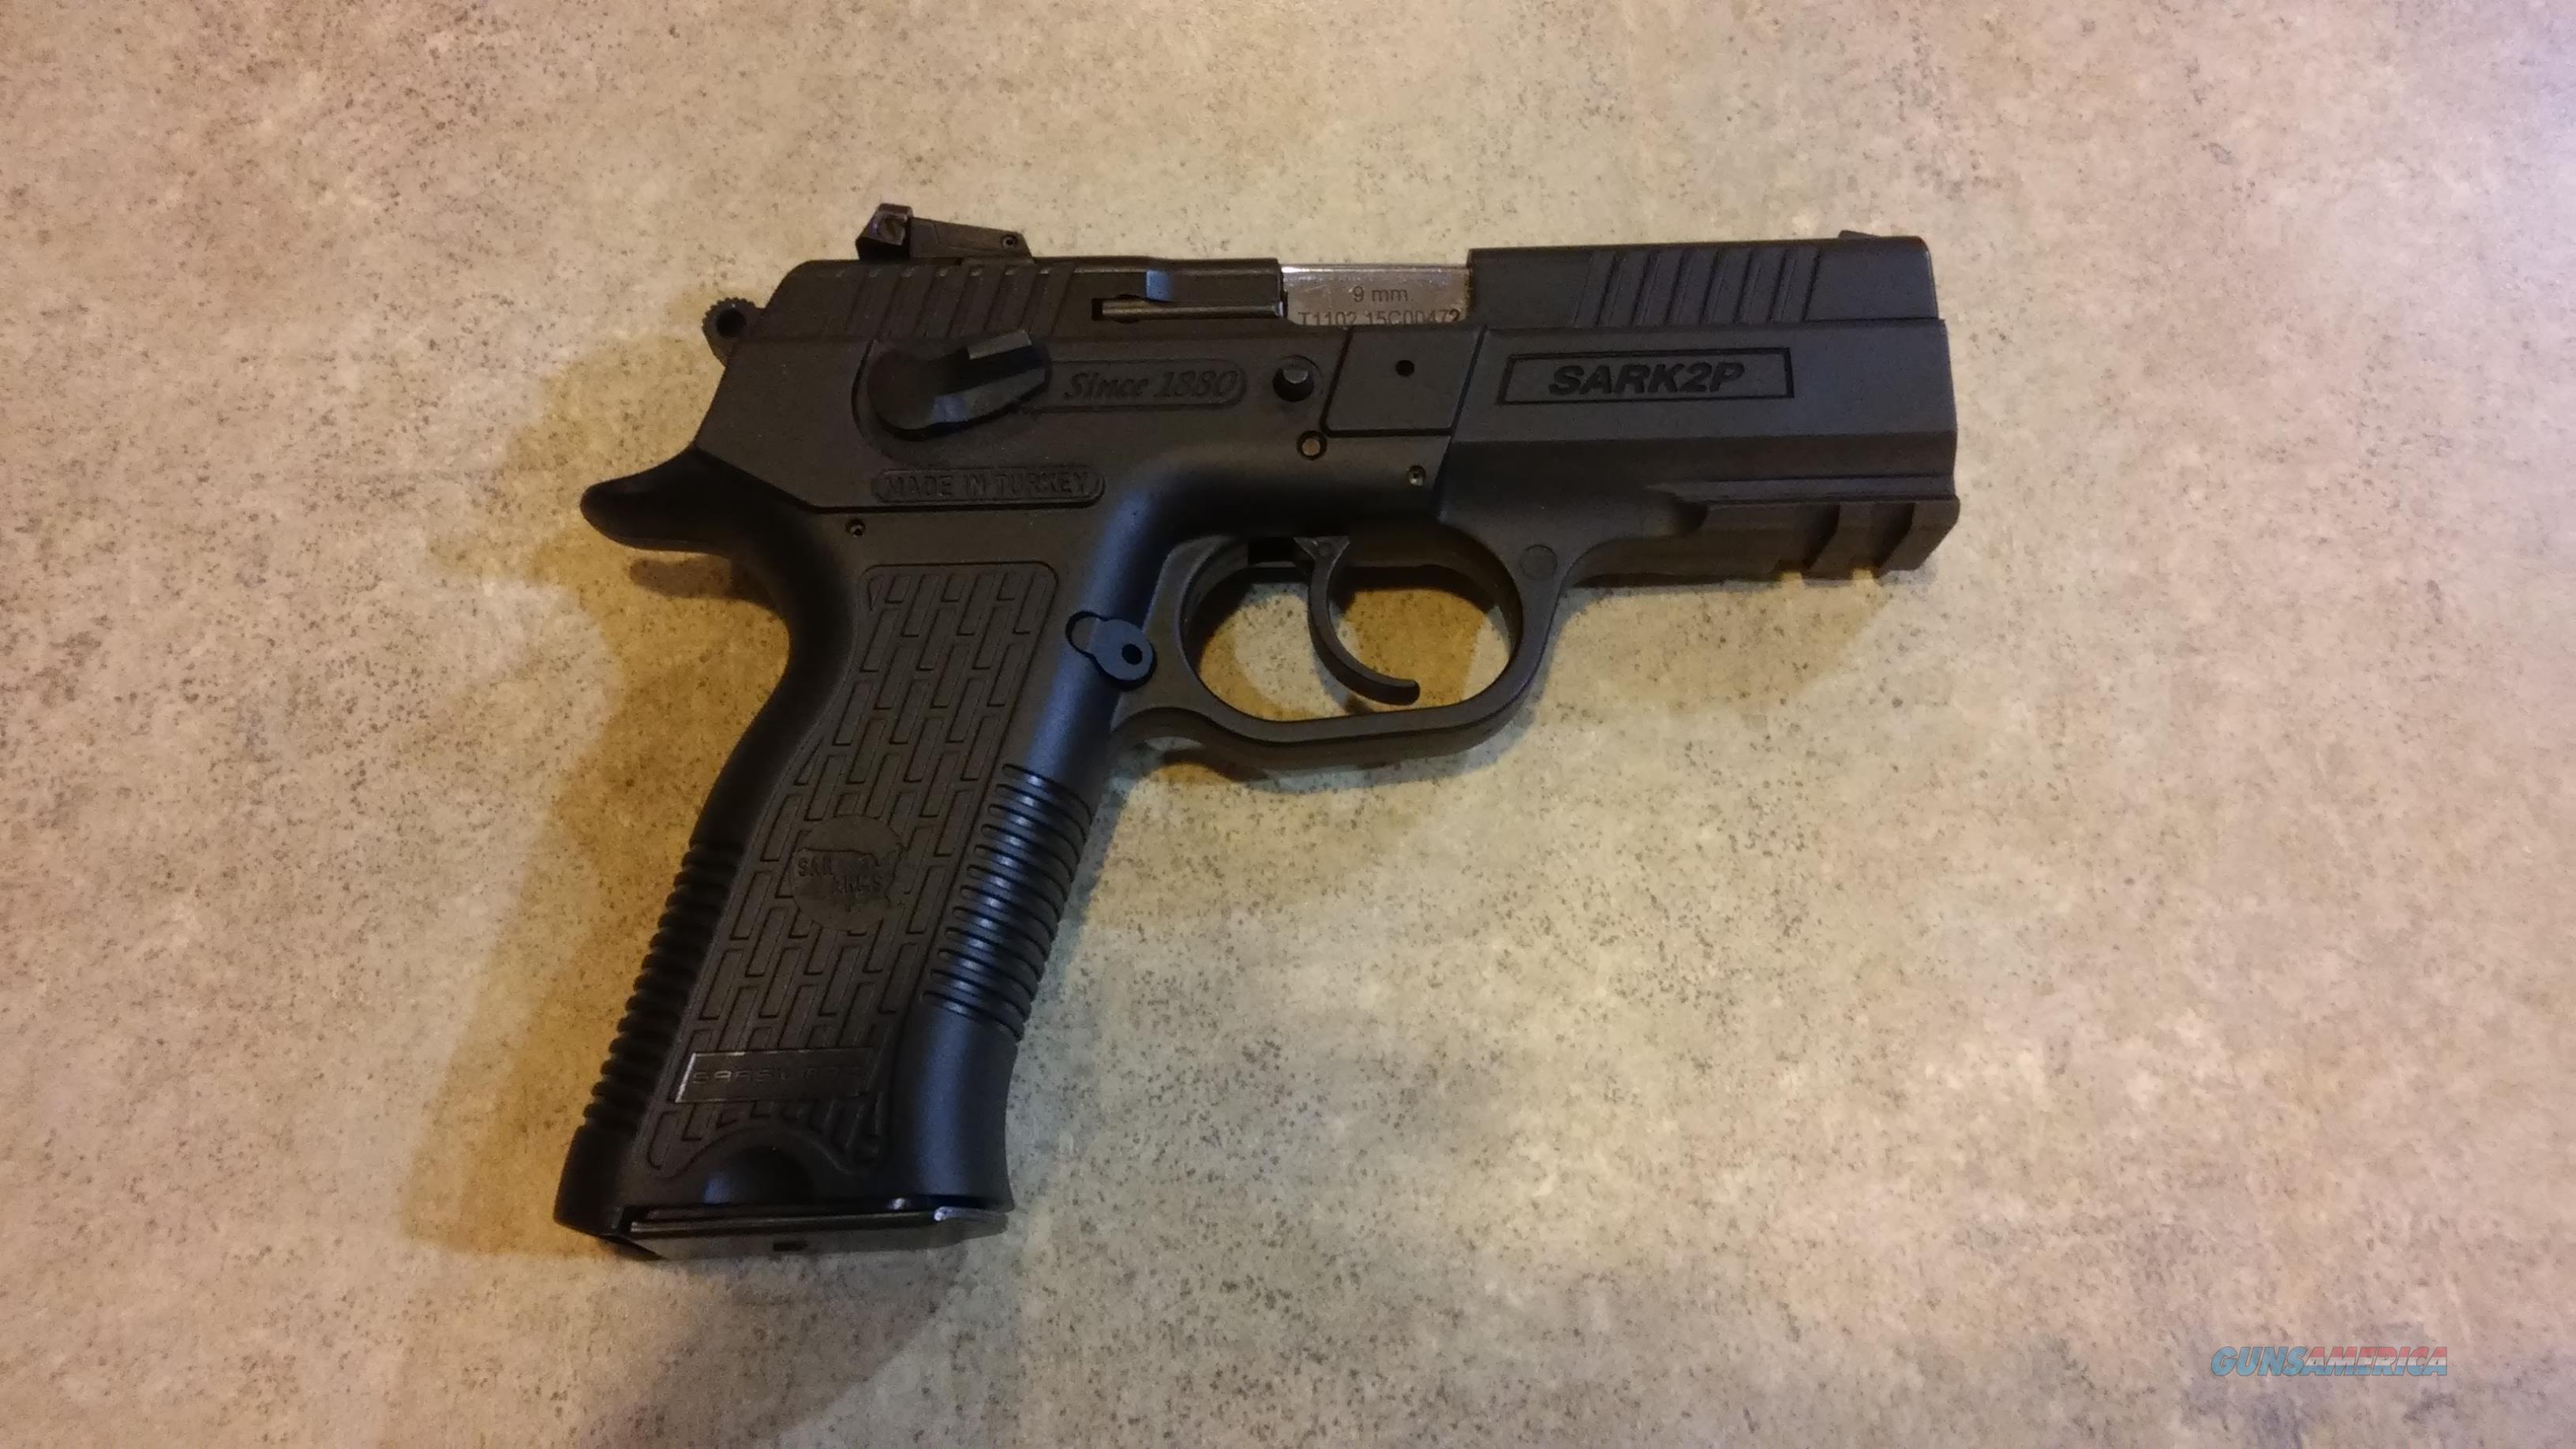 Eaa sar arms k2 9mm 17